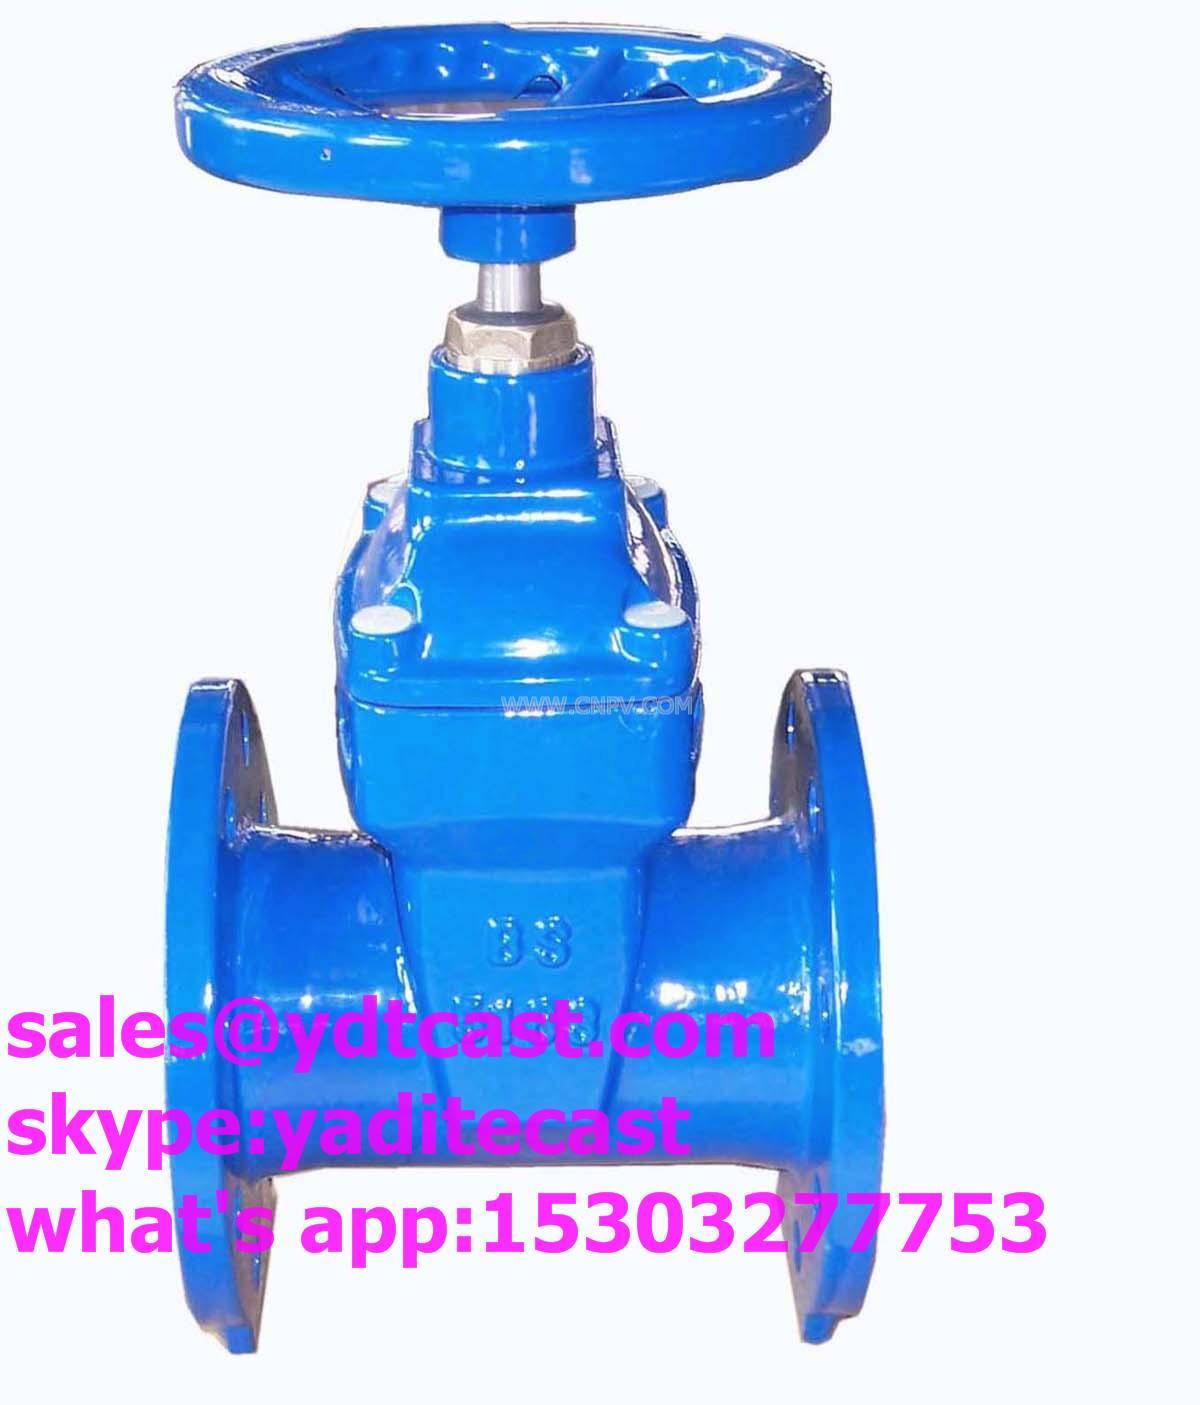 din gate valve din3352 f4/dn100 gate valve